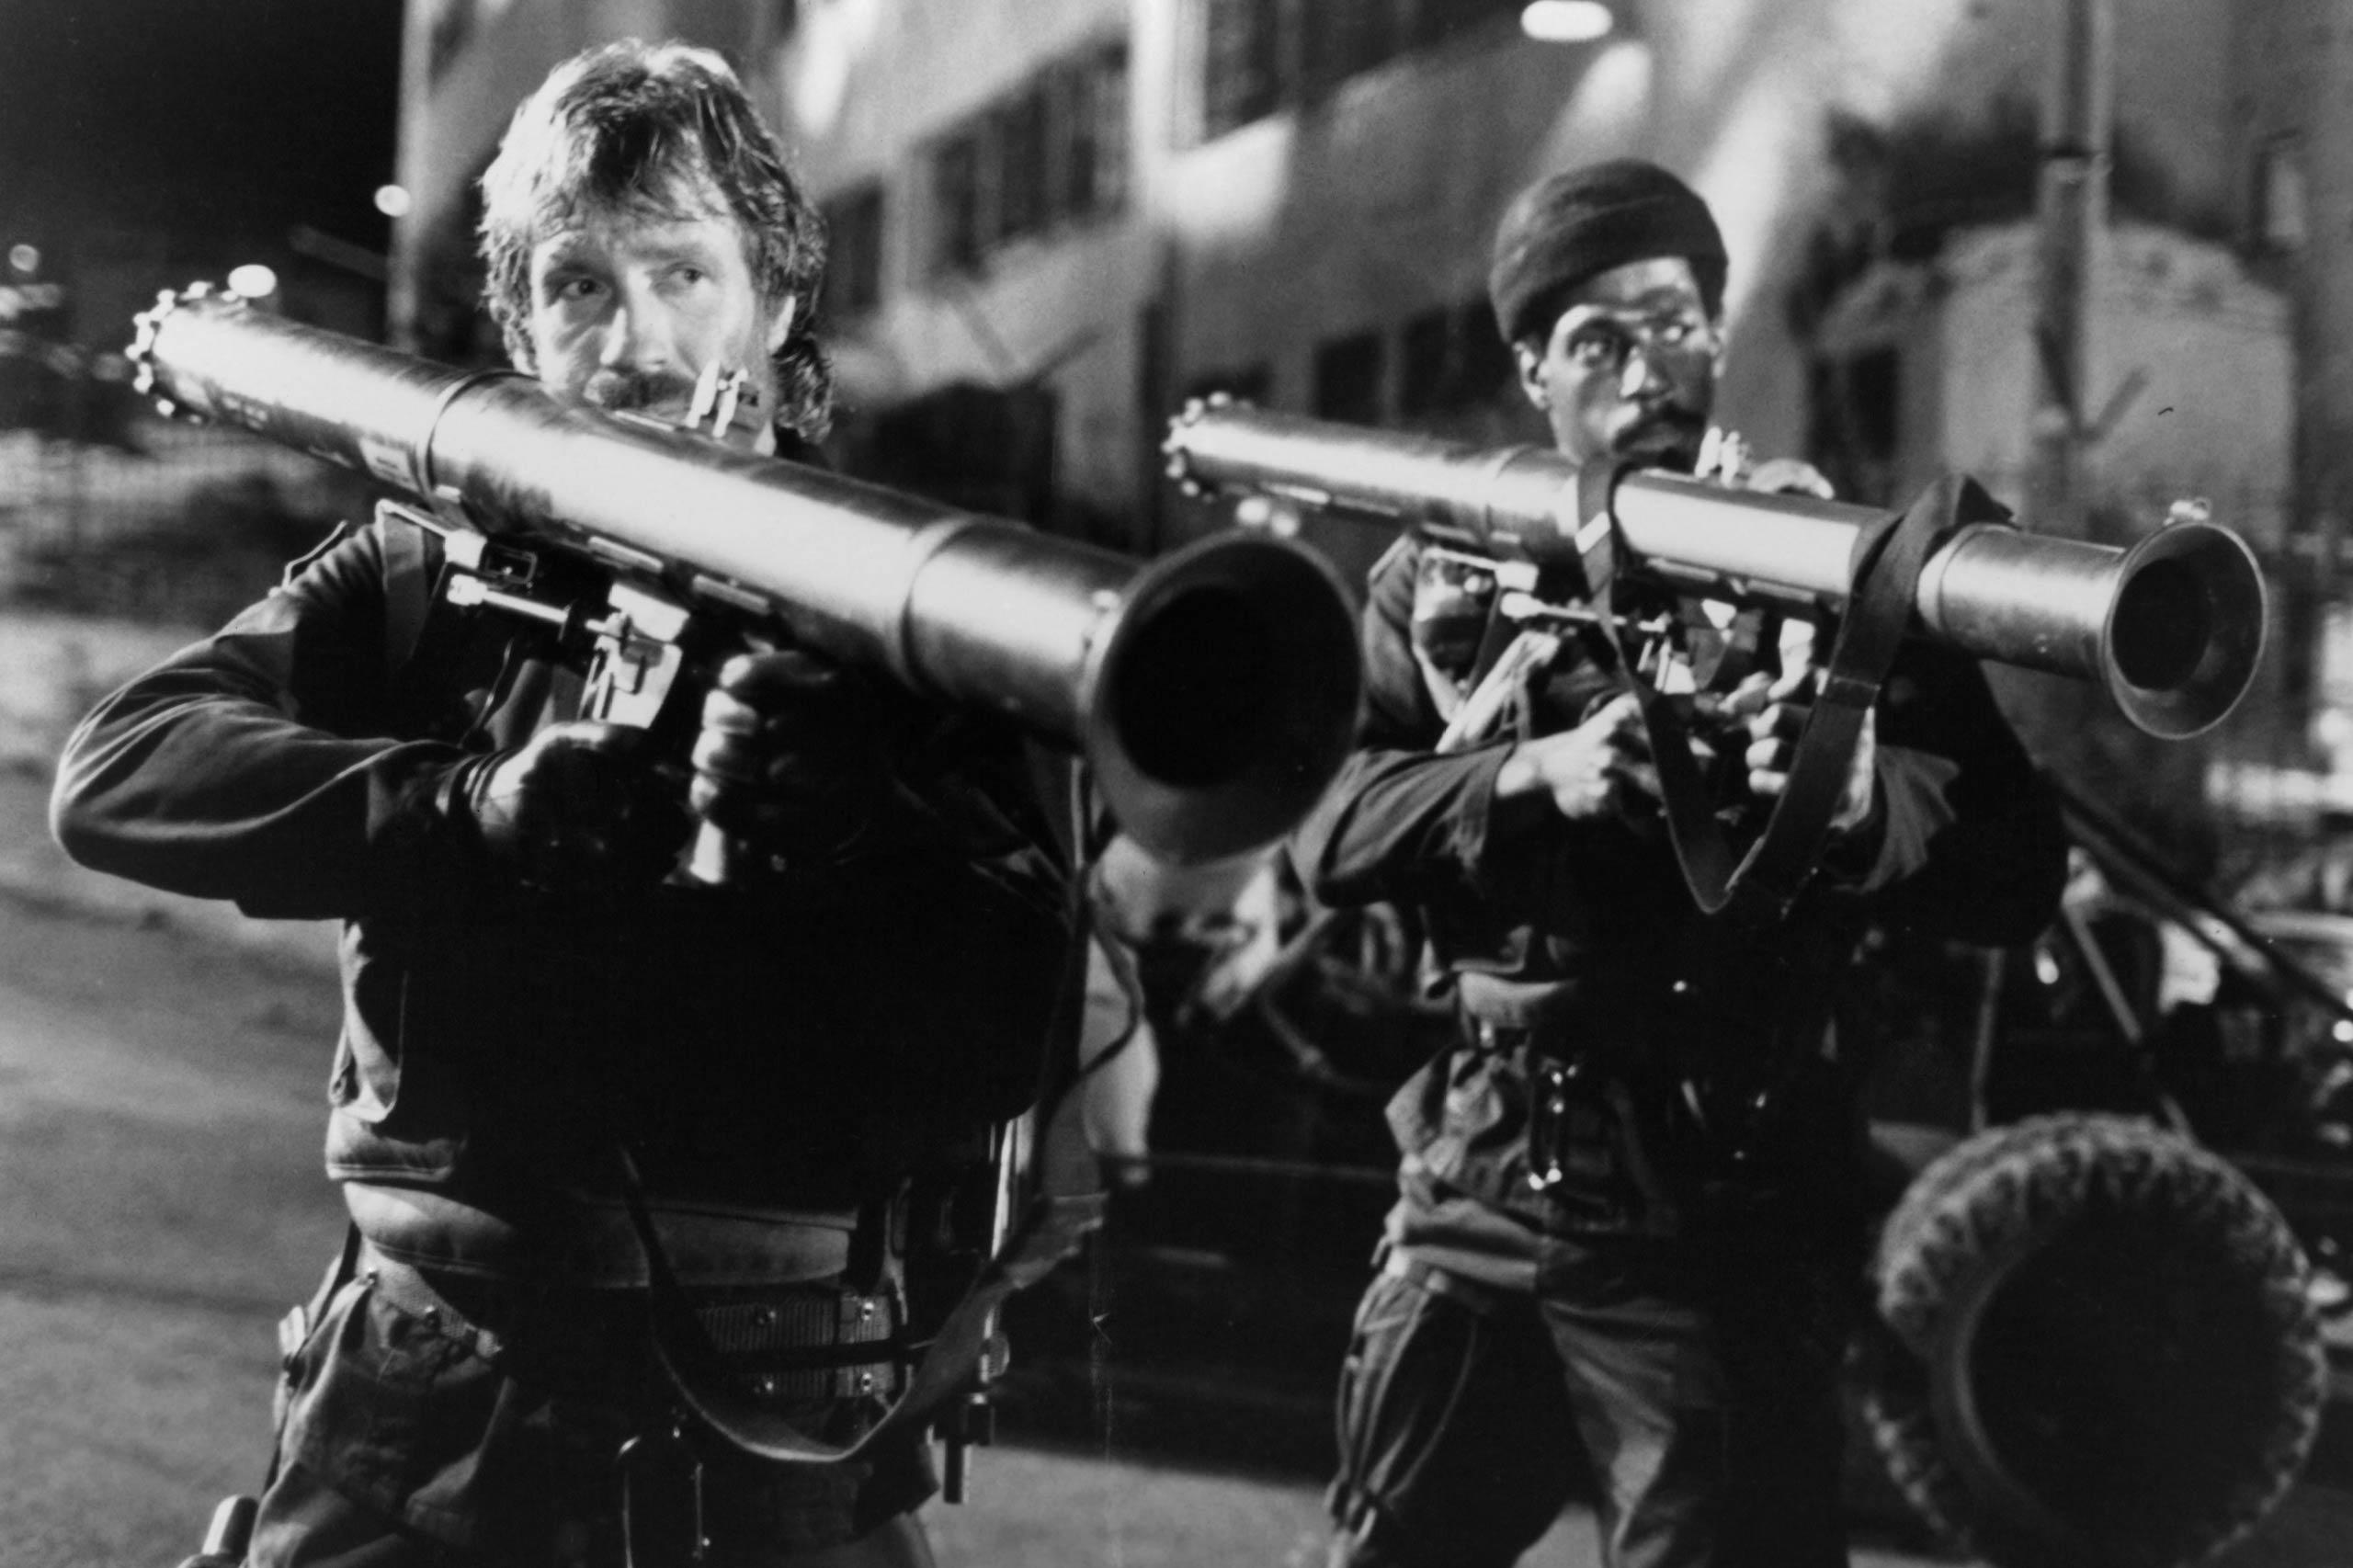 Chuck Norris as Major Scott McCoy in The Delta Force, 1986.